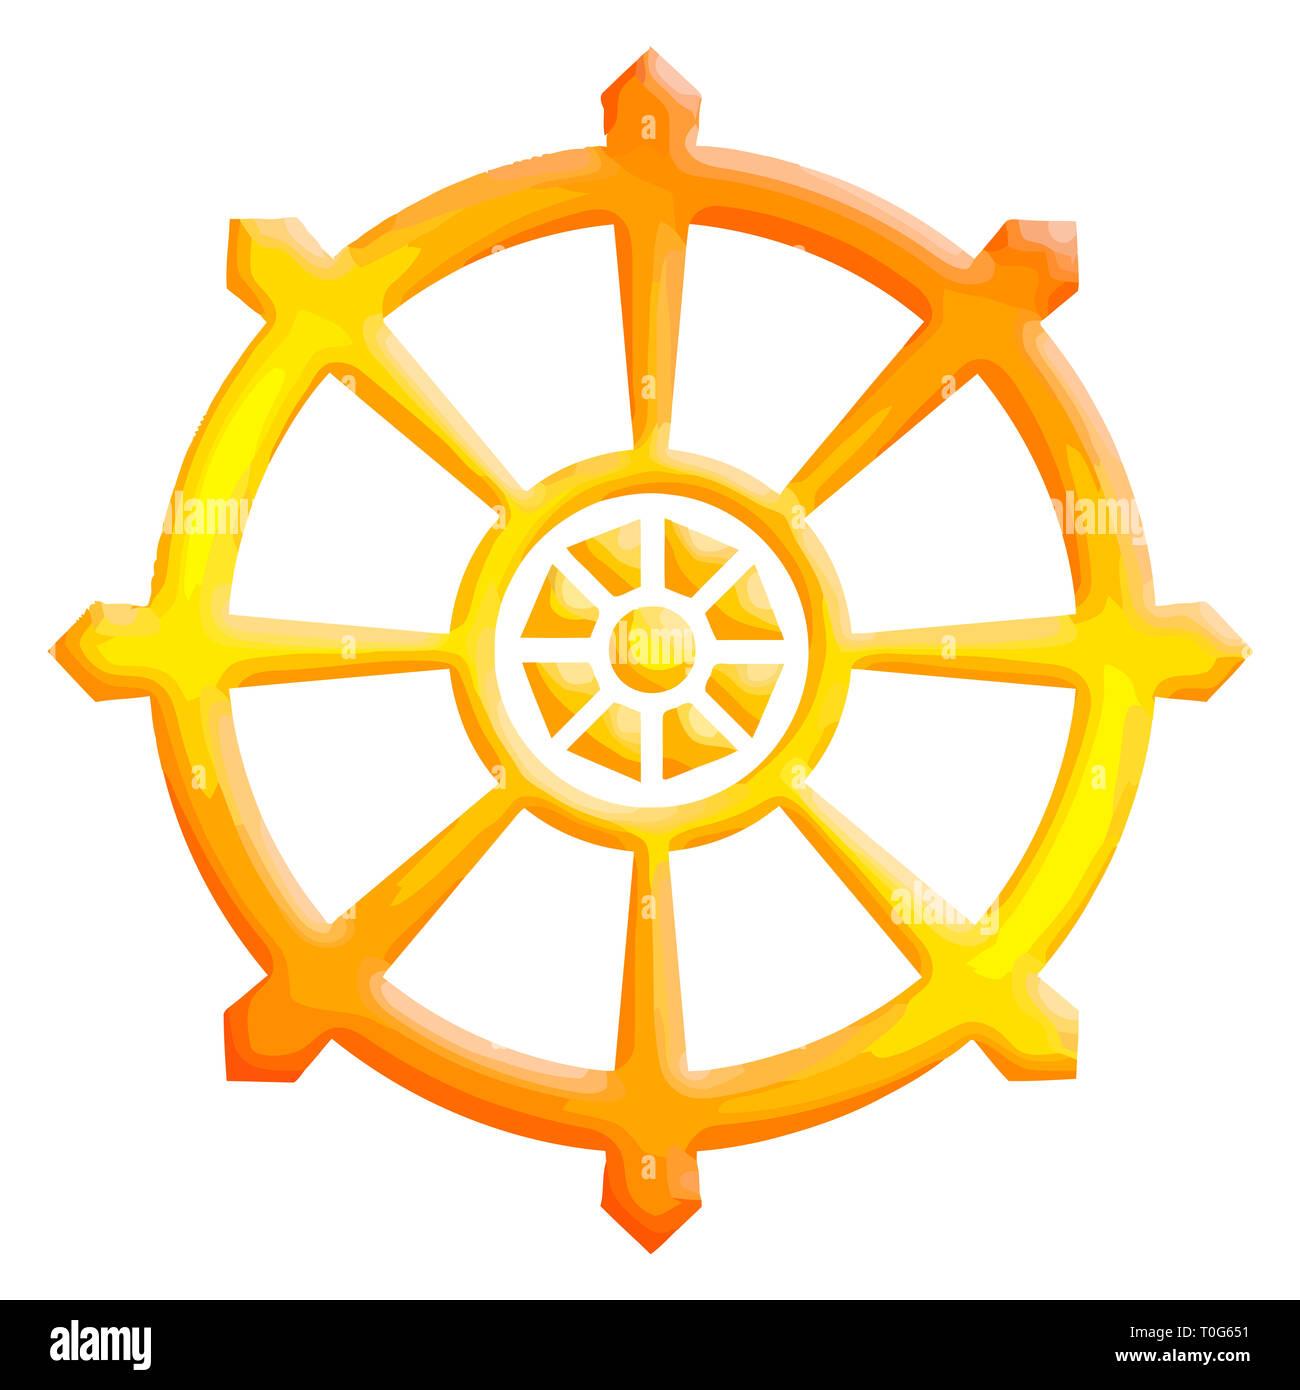 chakra buddhism wheel of dharma yellow illustration - Stock Image